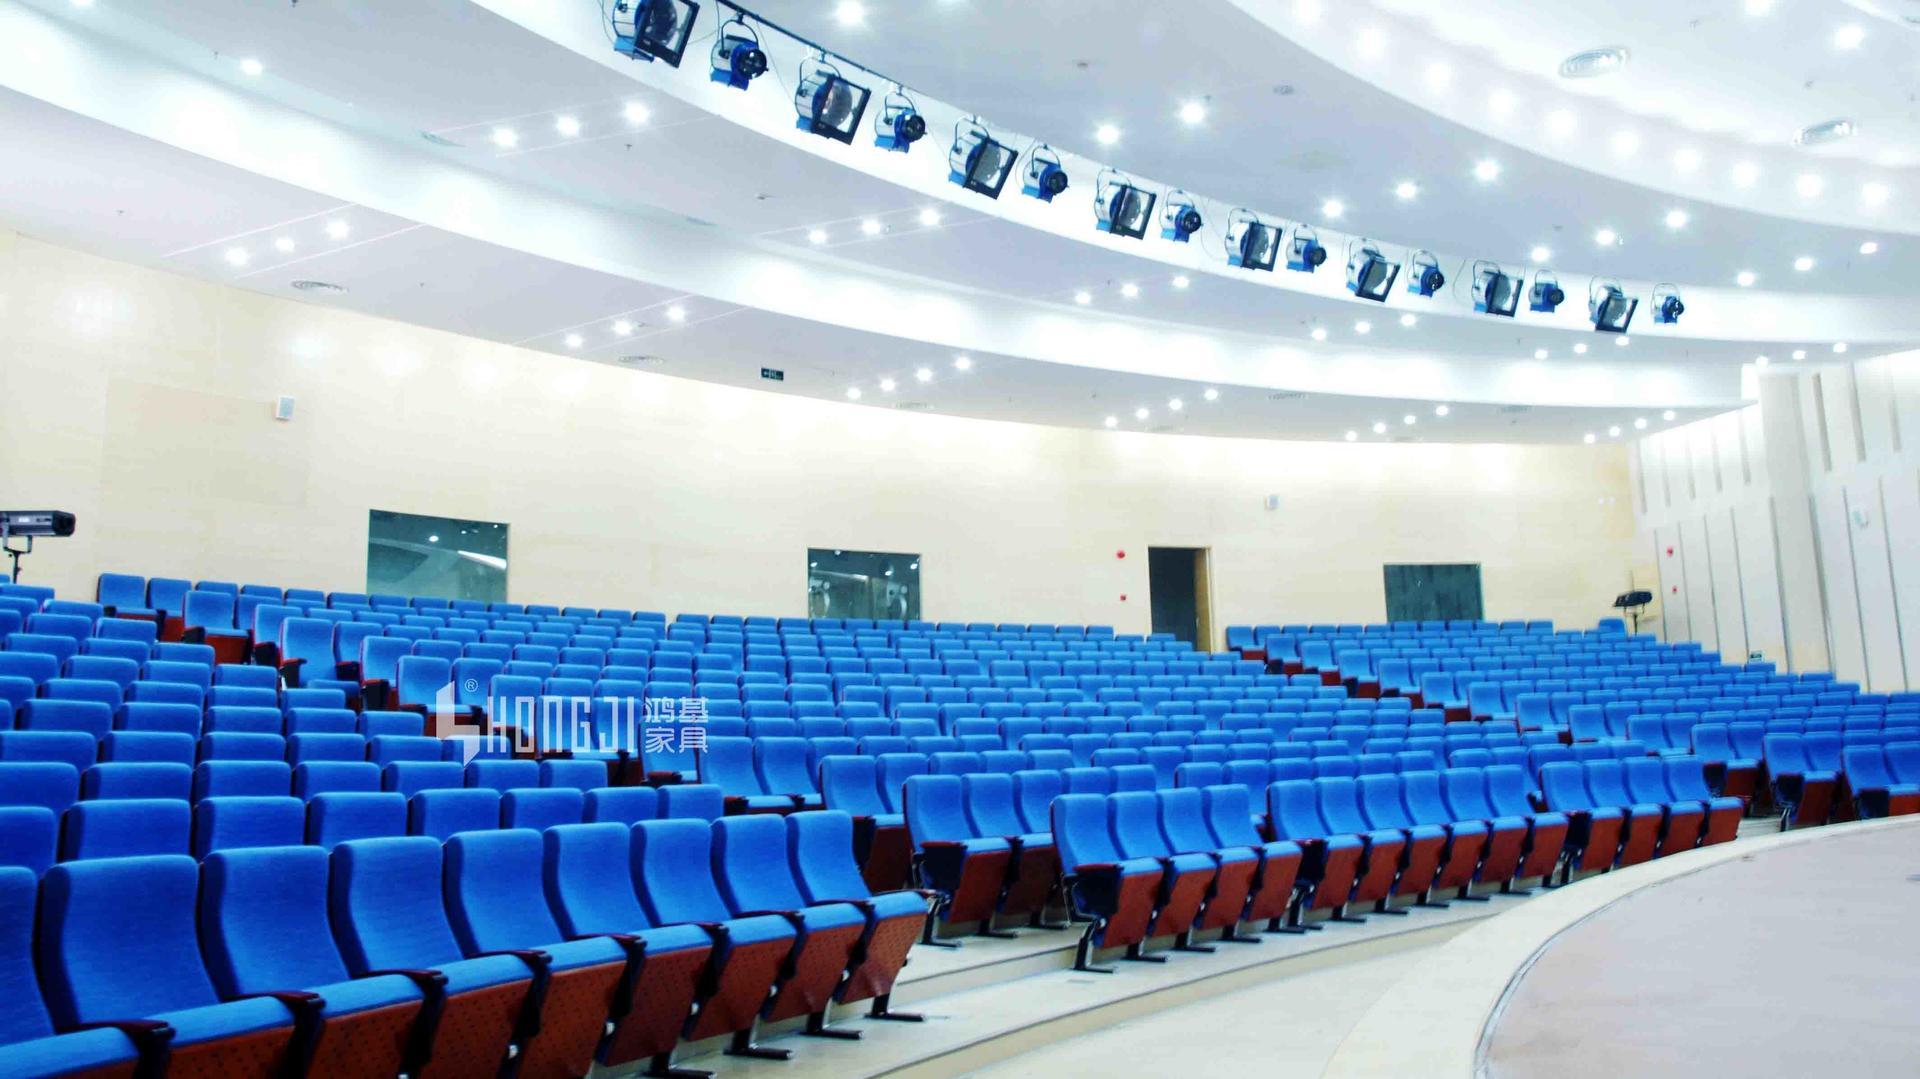 connection pedestal cover university auditorium chairs HONGJI